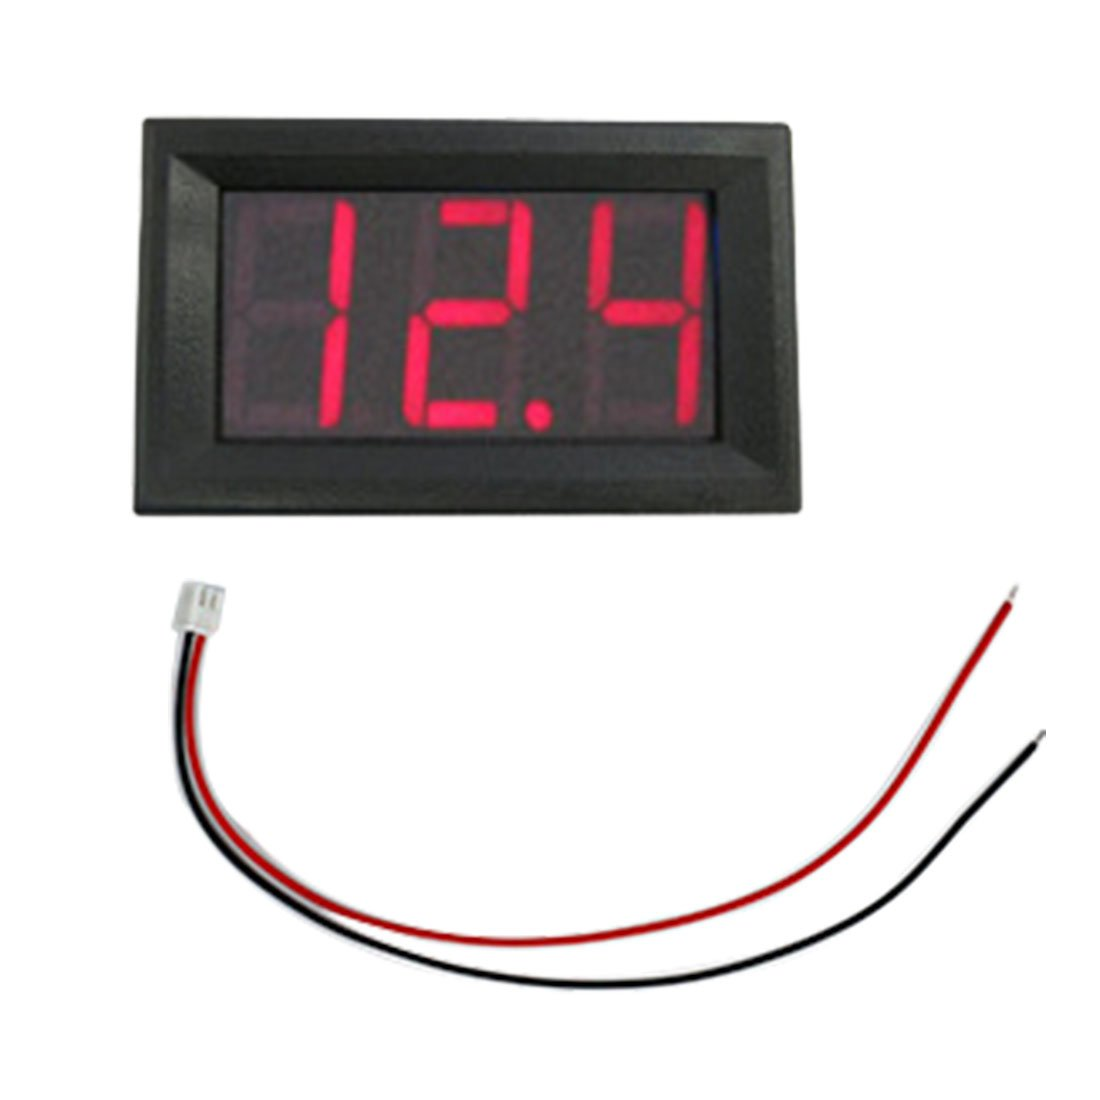 1,4 cm LCD LED Panel Meter Digital Voltmeter mit-Draht -, rot ...